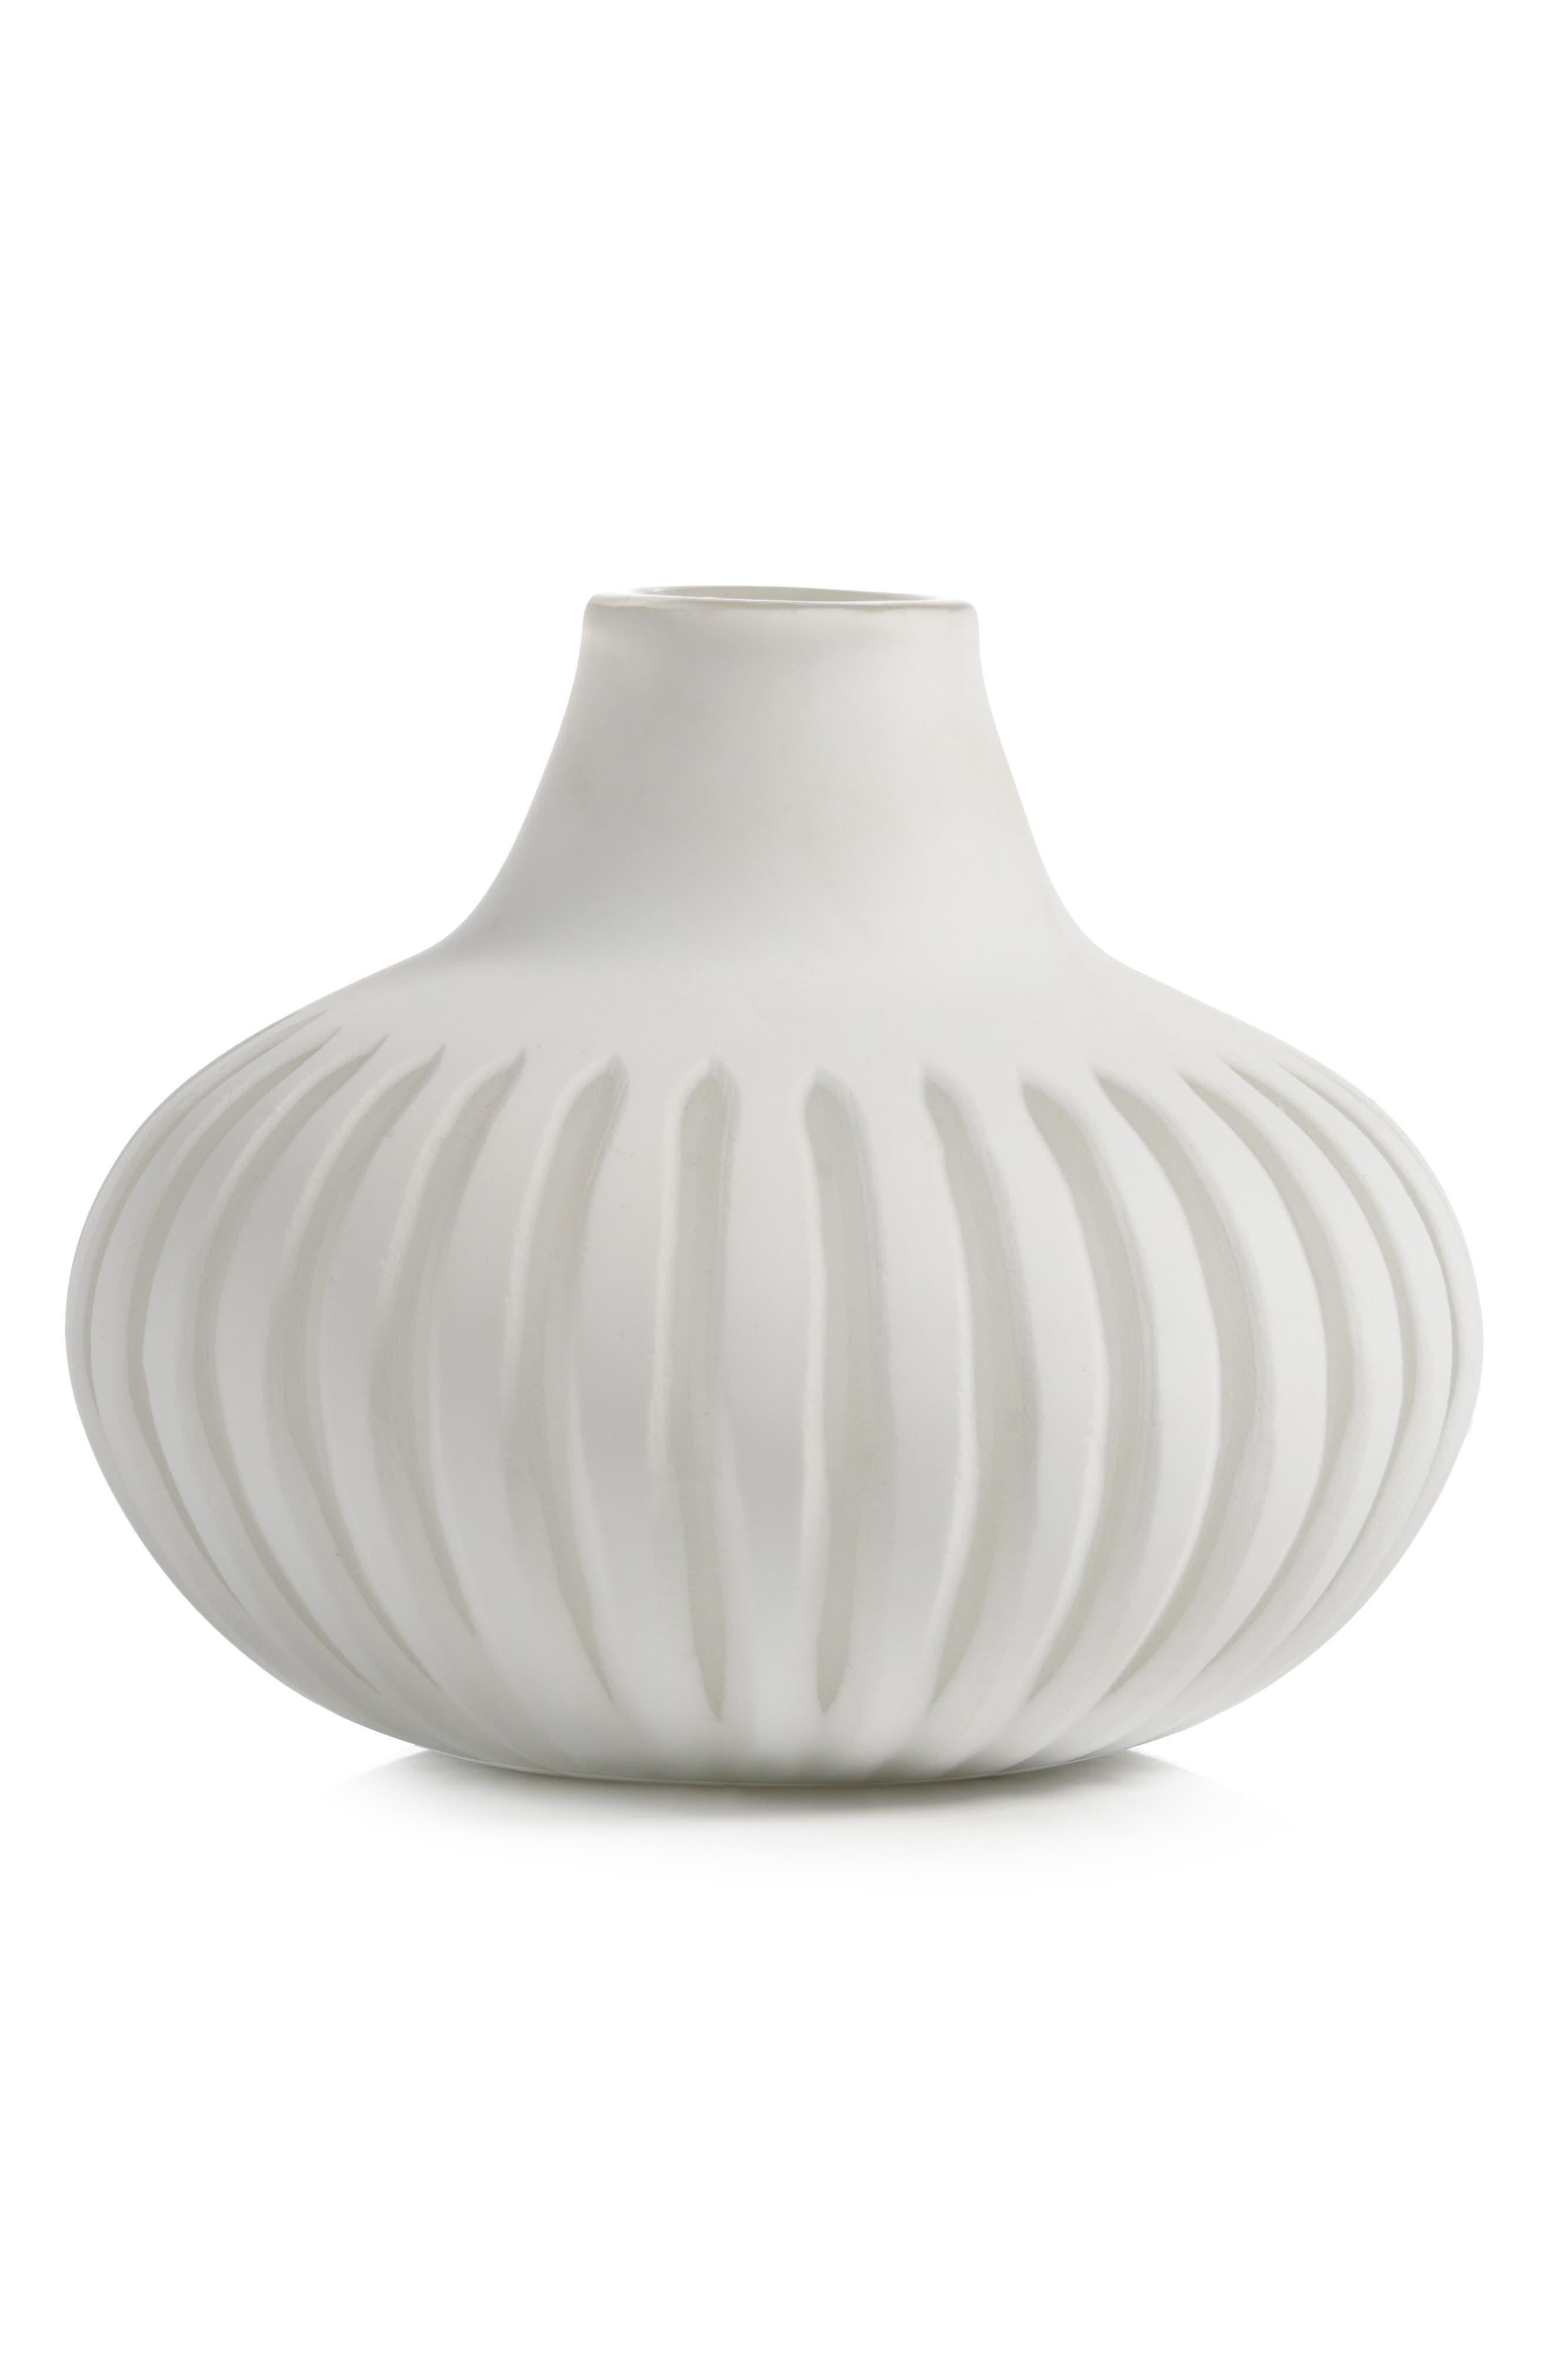 Sakana Glass Vase,                             Main thumbnail 1, color,                             White